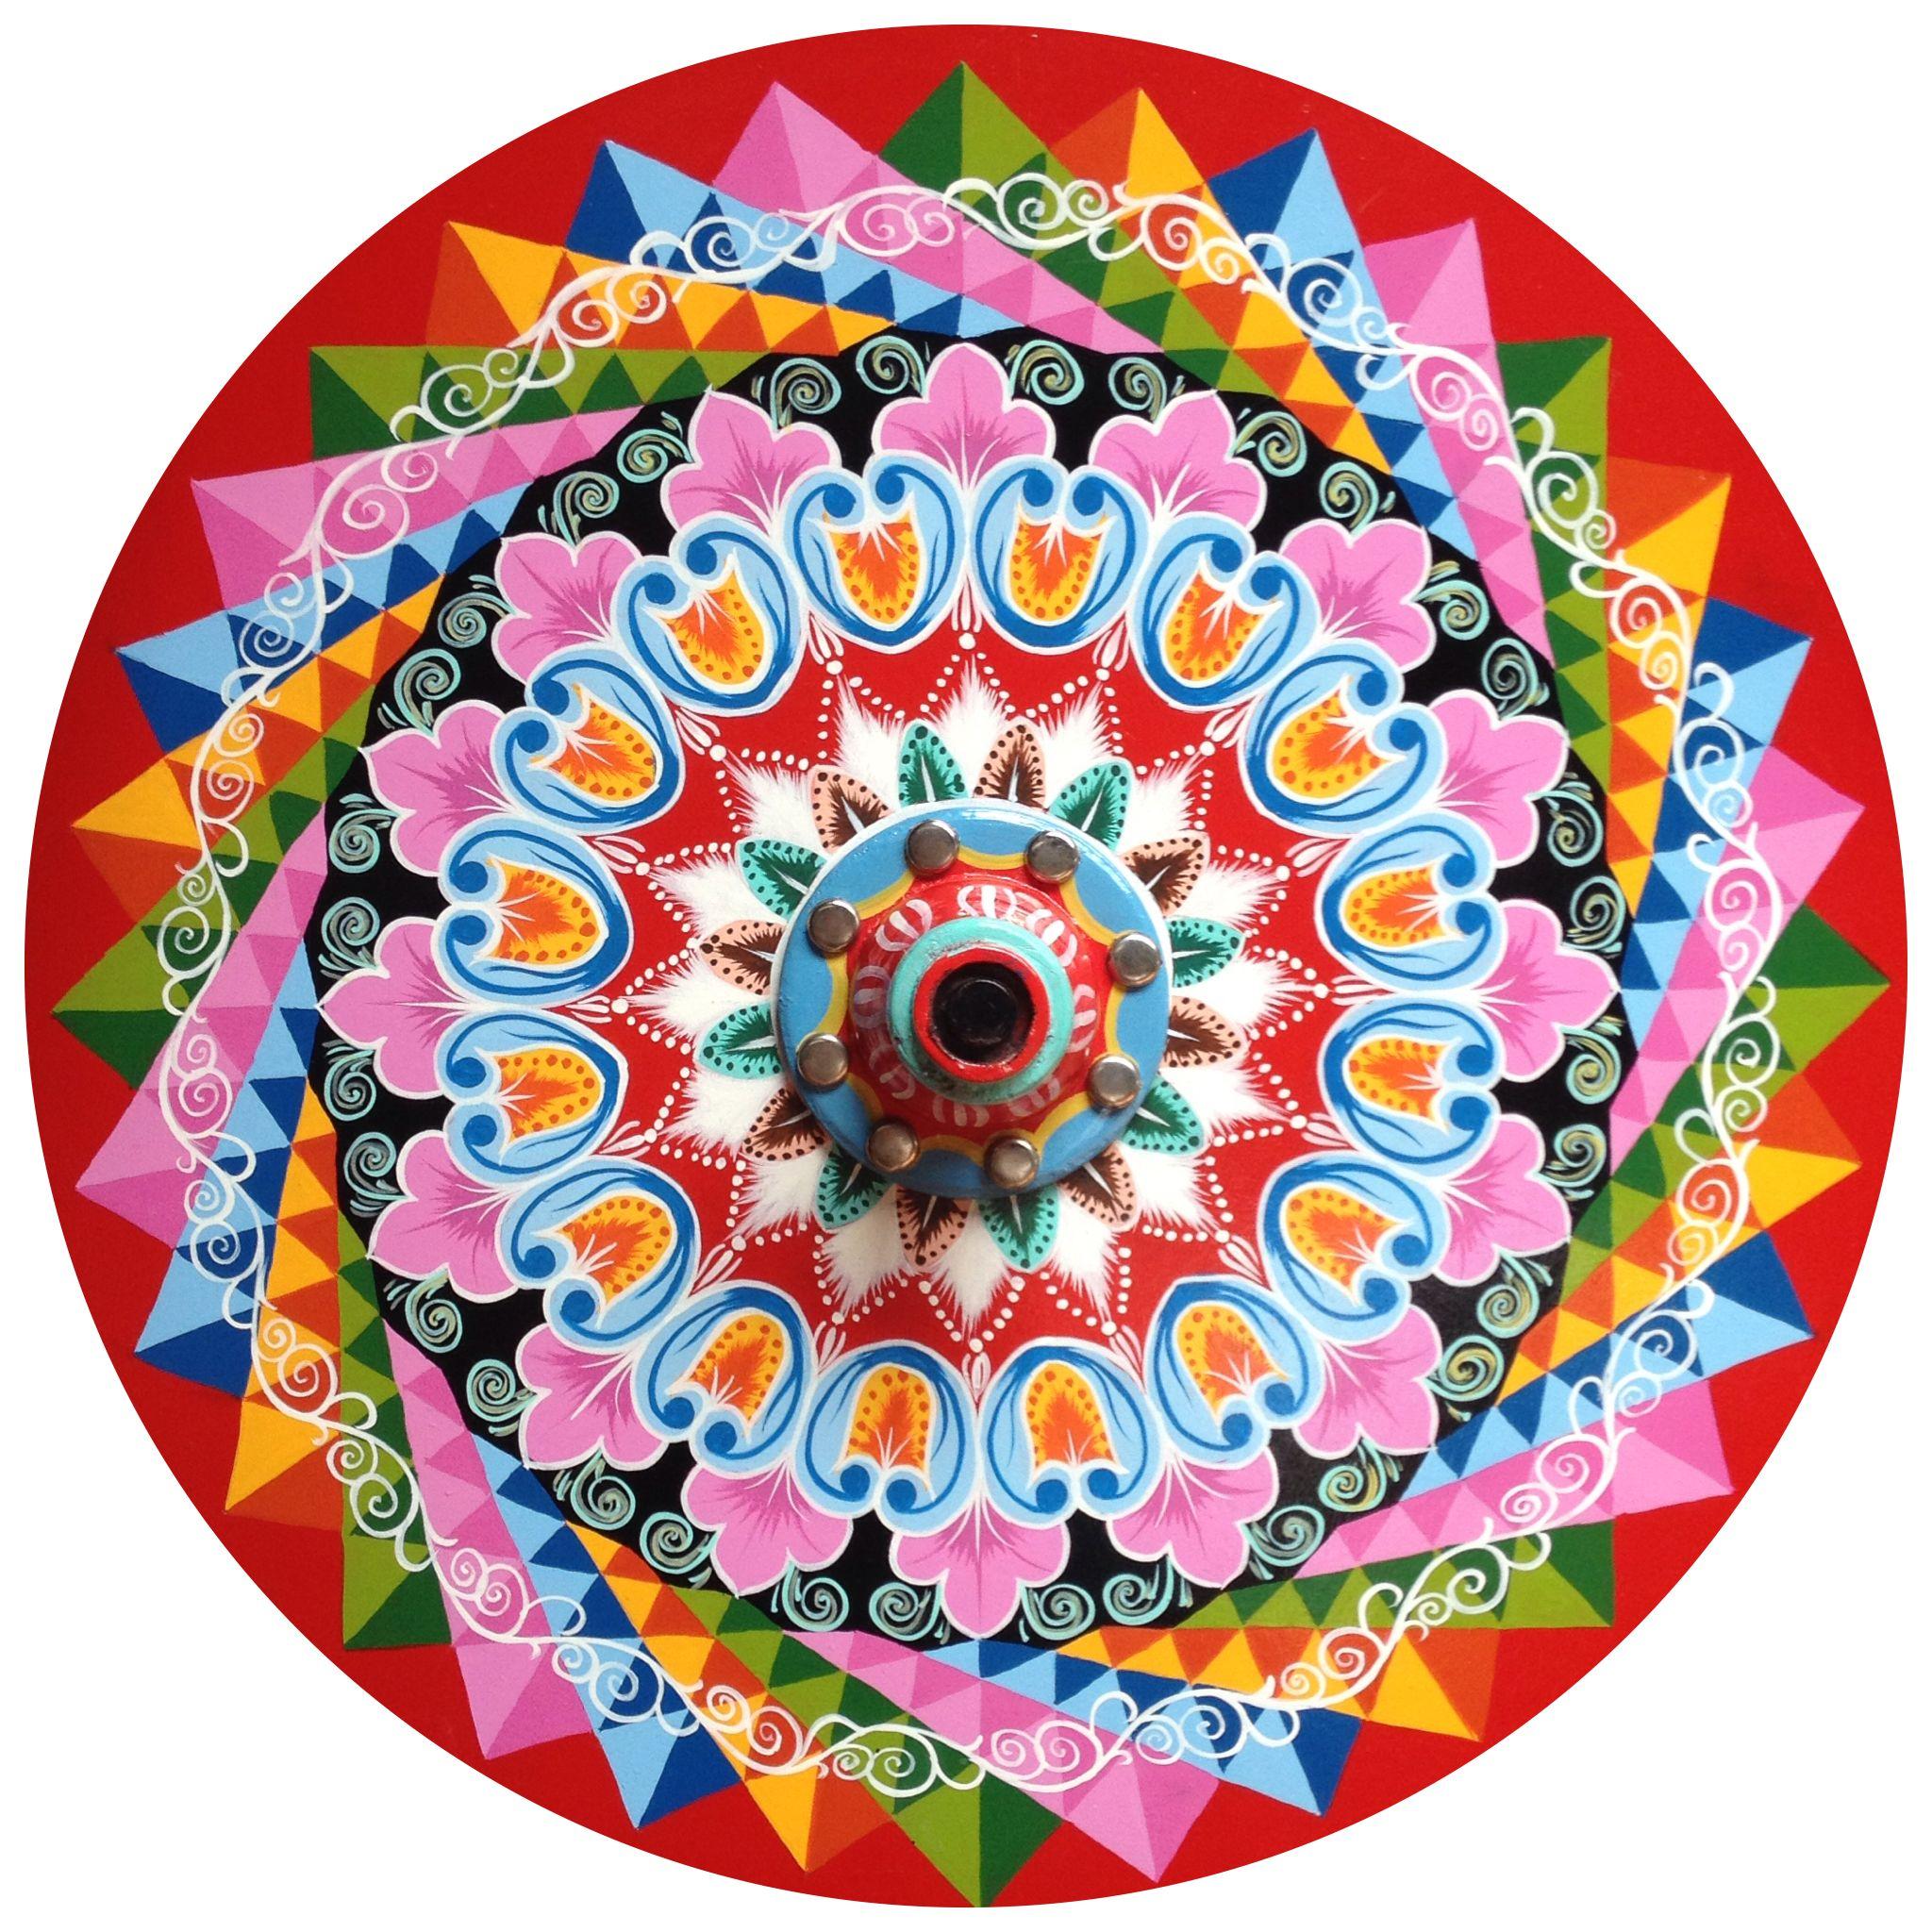 Rueda De Carreta Tipica De Costa Rica Buscar Con Google Costa Rica Art Costa Rican Mandala Drawing